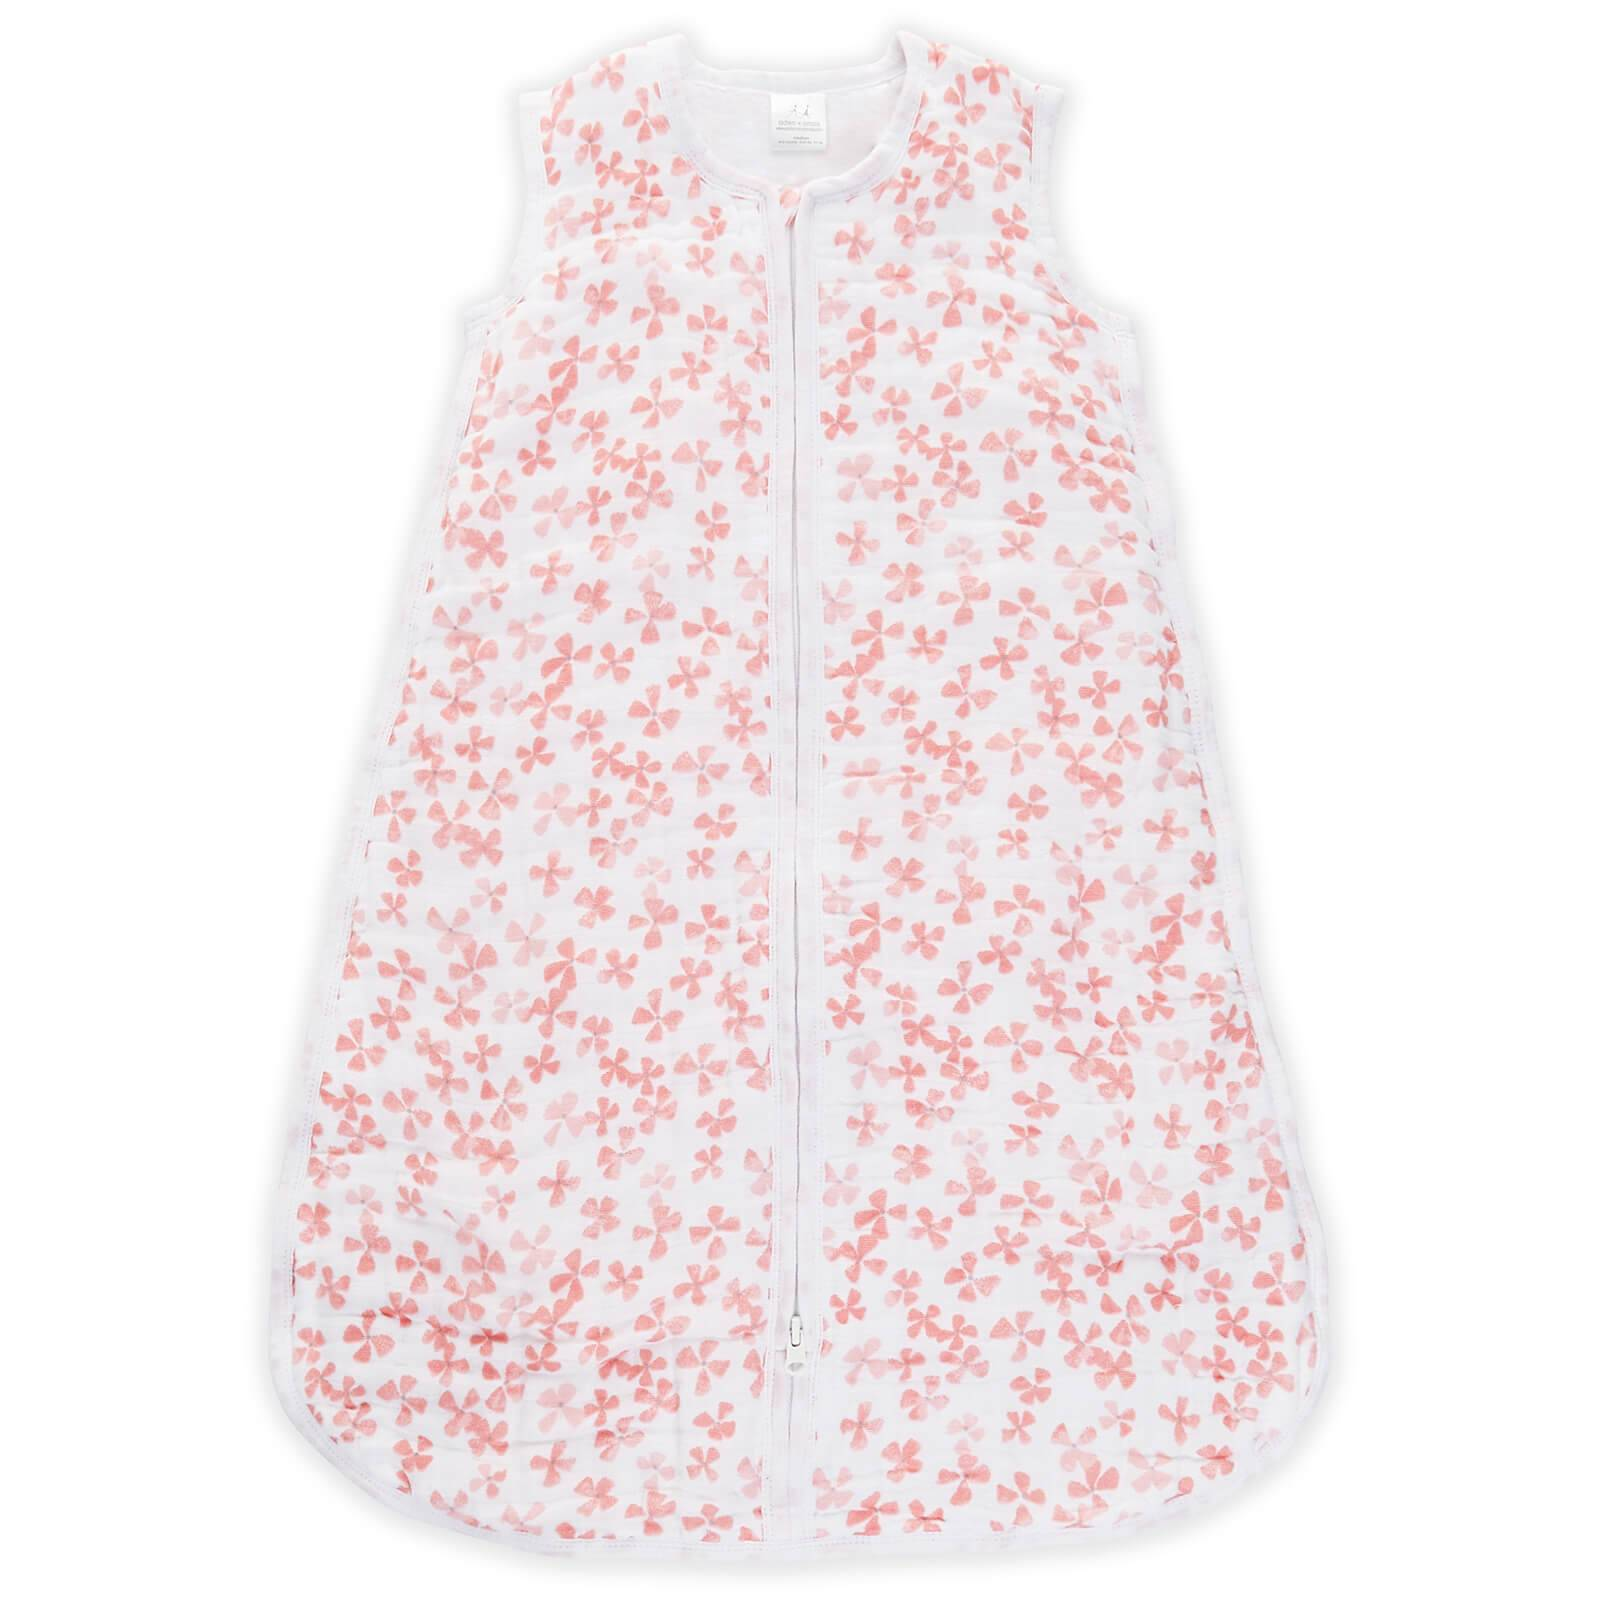 aden + anais Multi-Layer Sleeping Bag - Birdsong - Blossom - 12-18 months